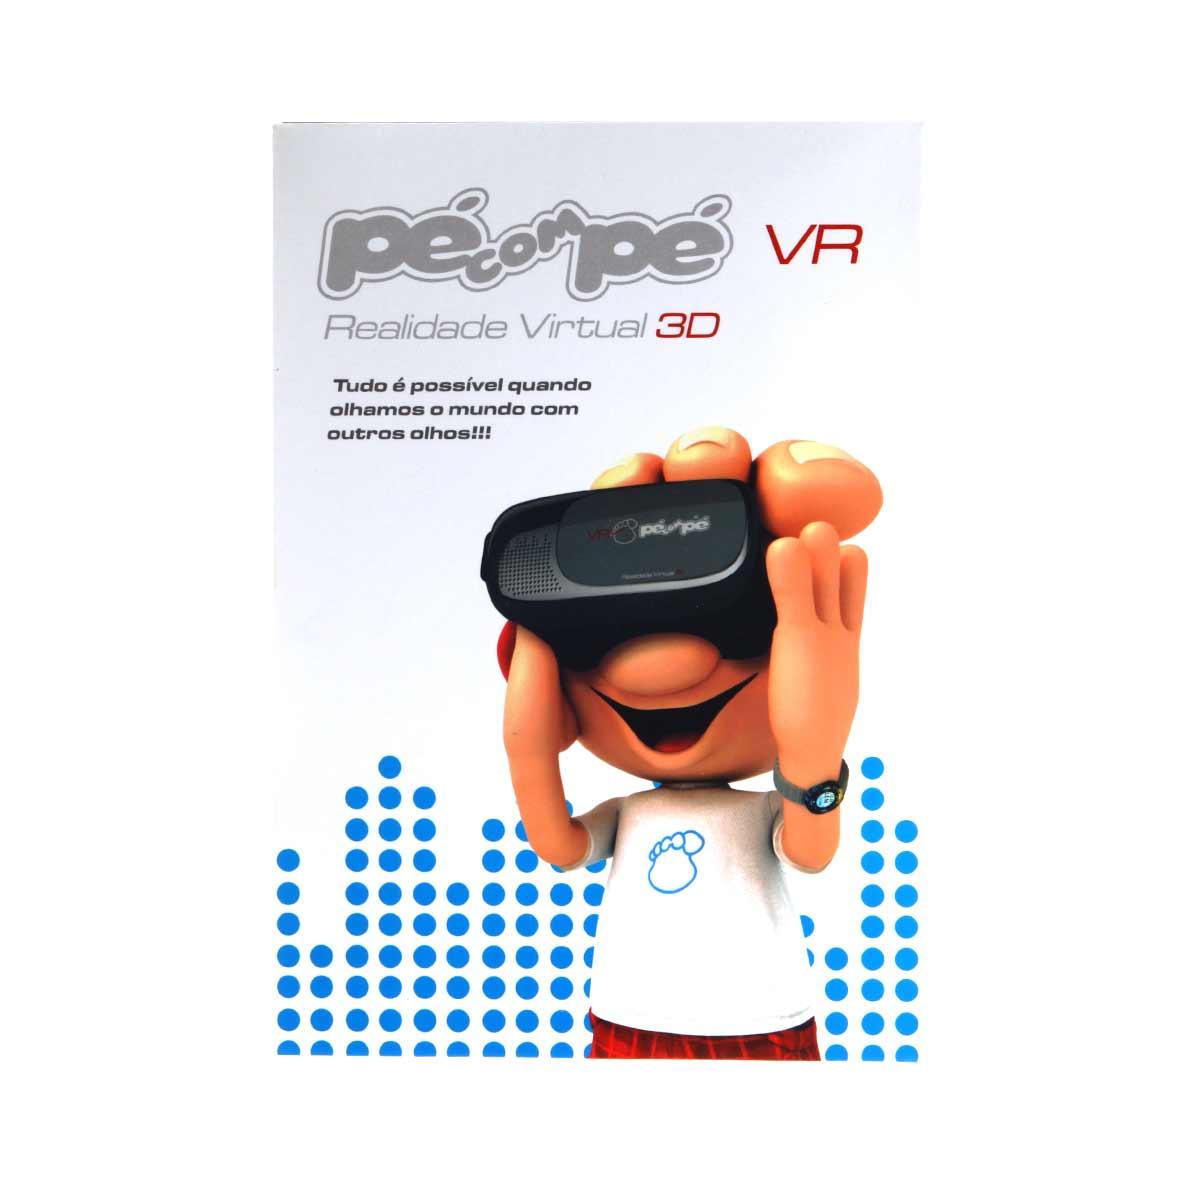 Tênis Pé com Pè Menino VR Realidade Virtual 3D 60002